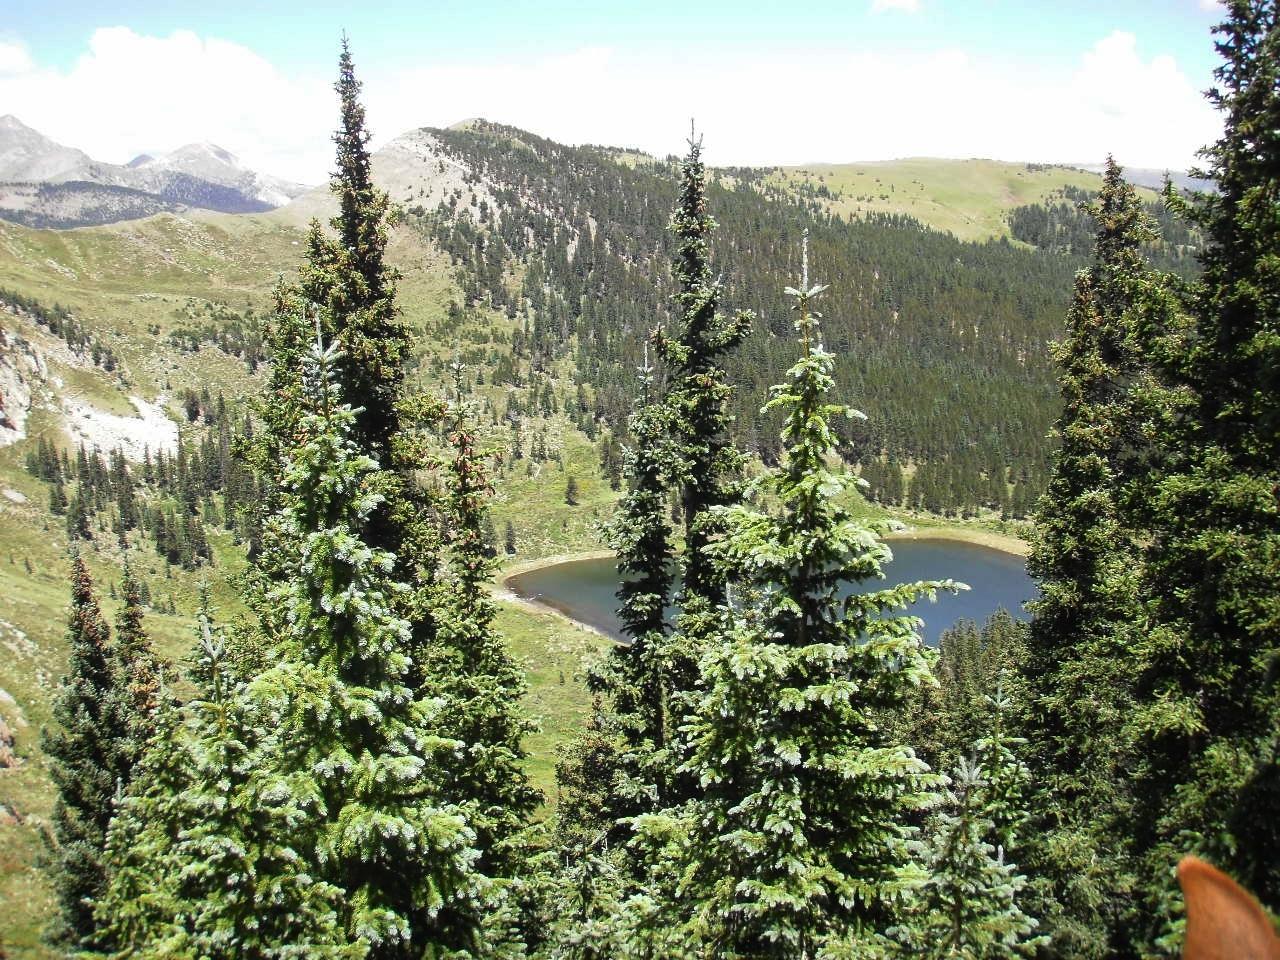 Pecos Baldy Lake | Photo Courtesy of Mike Archuleta